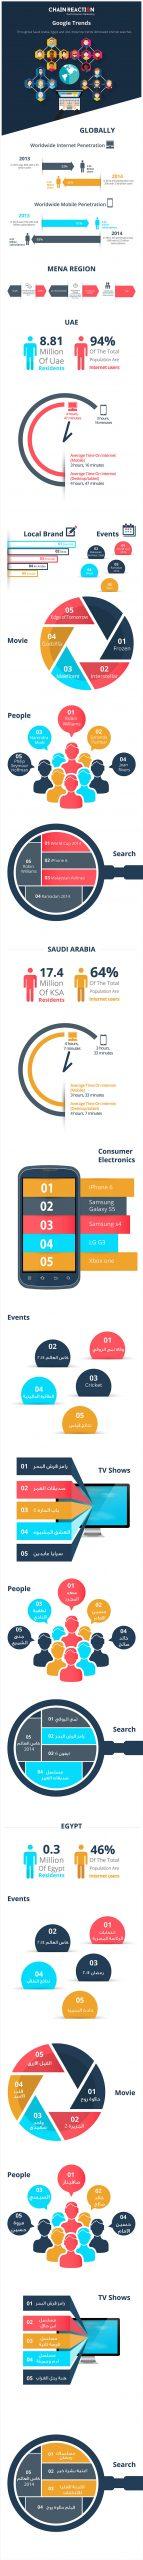 Google-Trends-01-info uae ksa